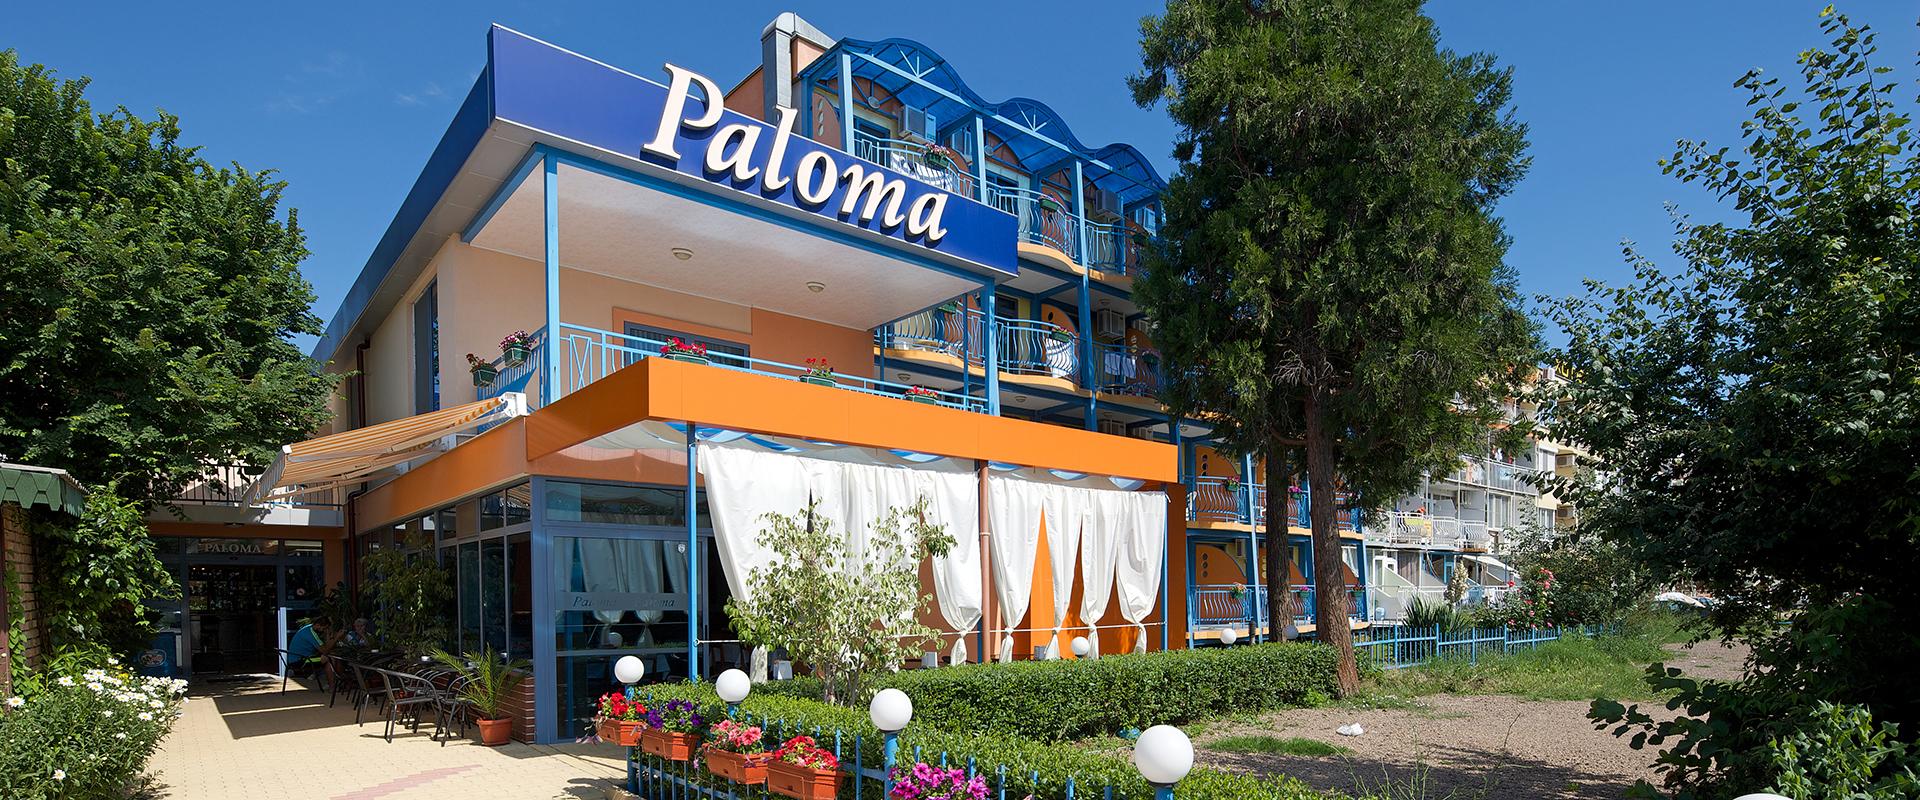 slide_paloma_1